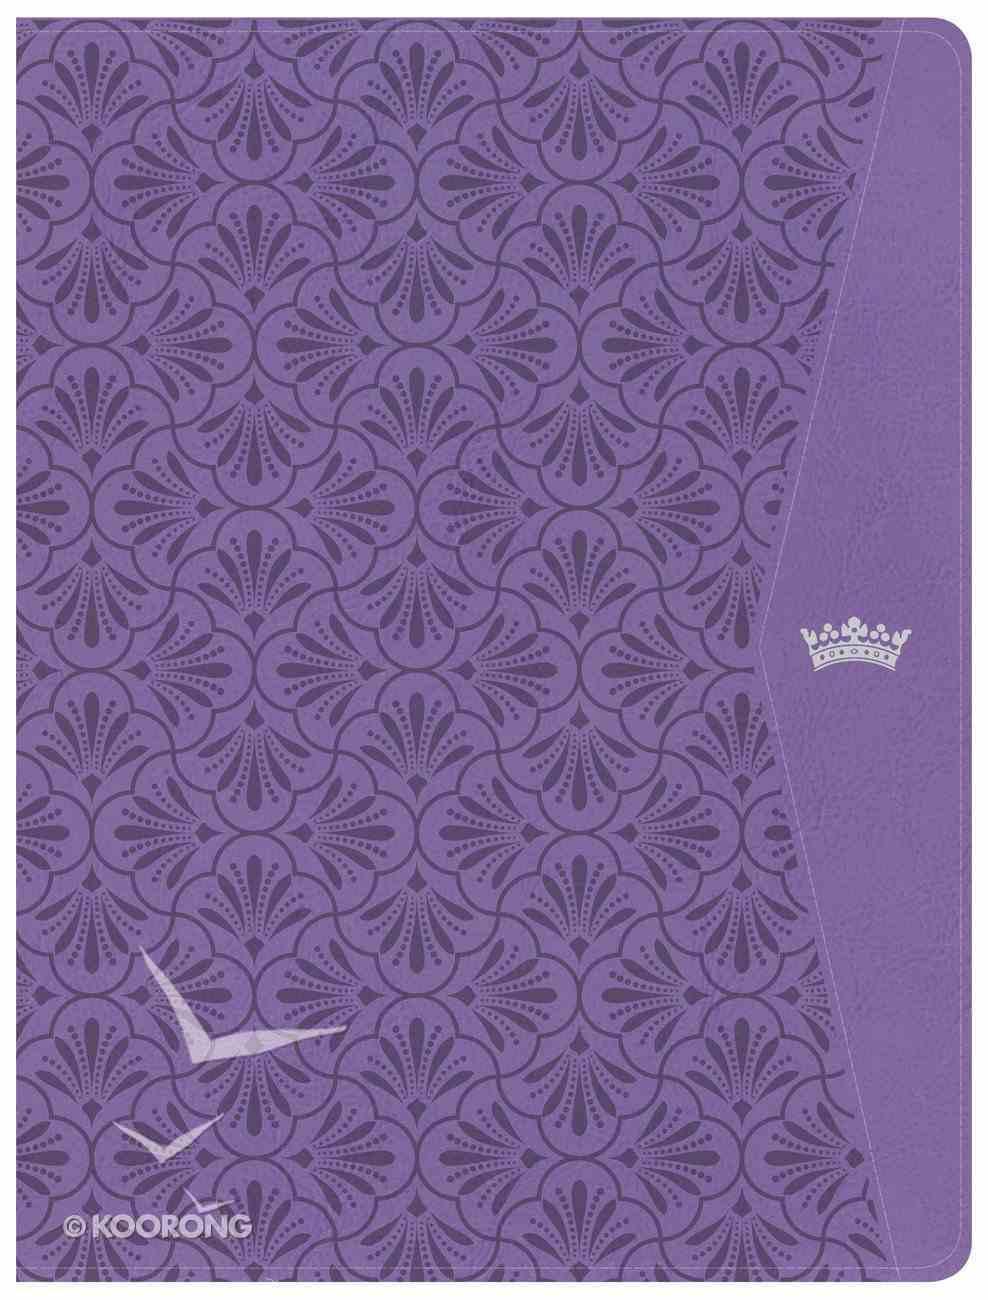 CSB Tony Evans Study Bible Purple (Black Letter Edition) Imitation Leather